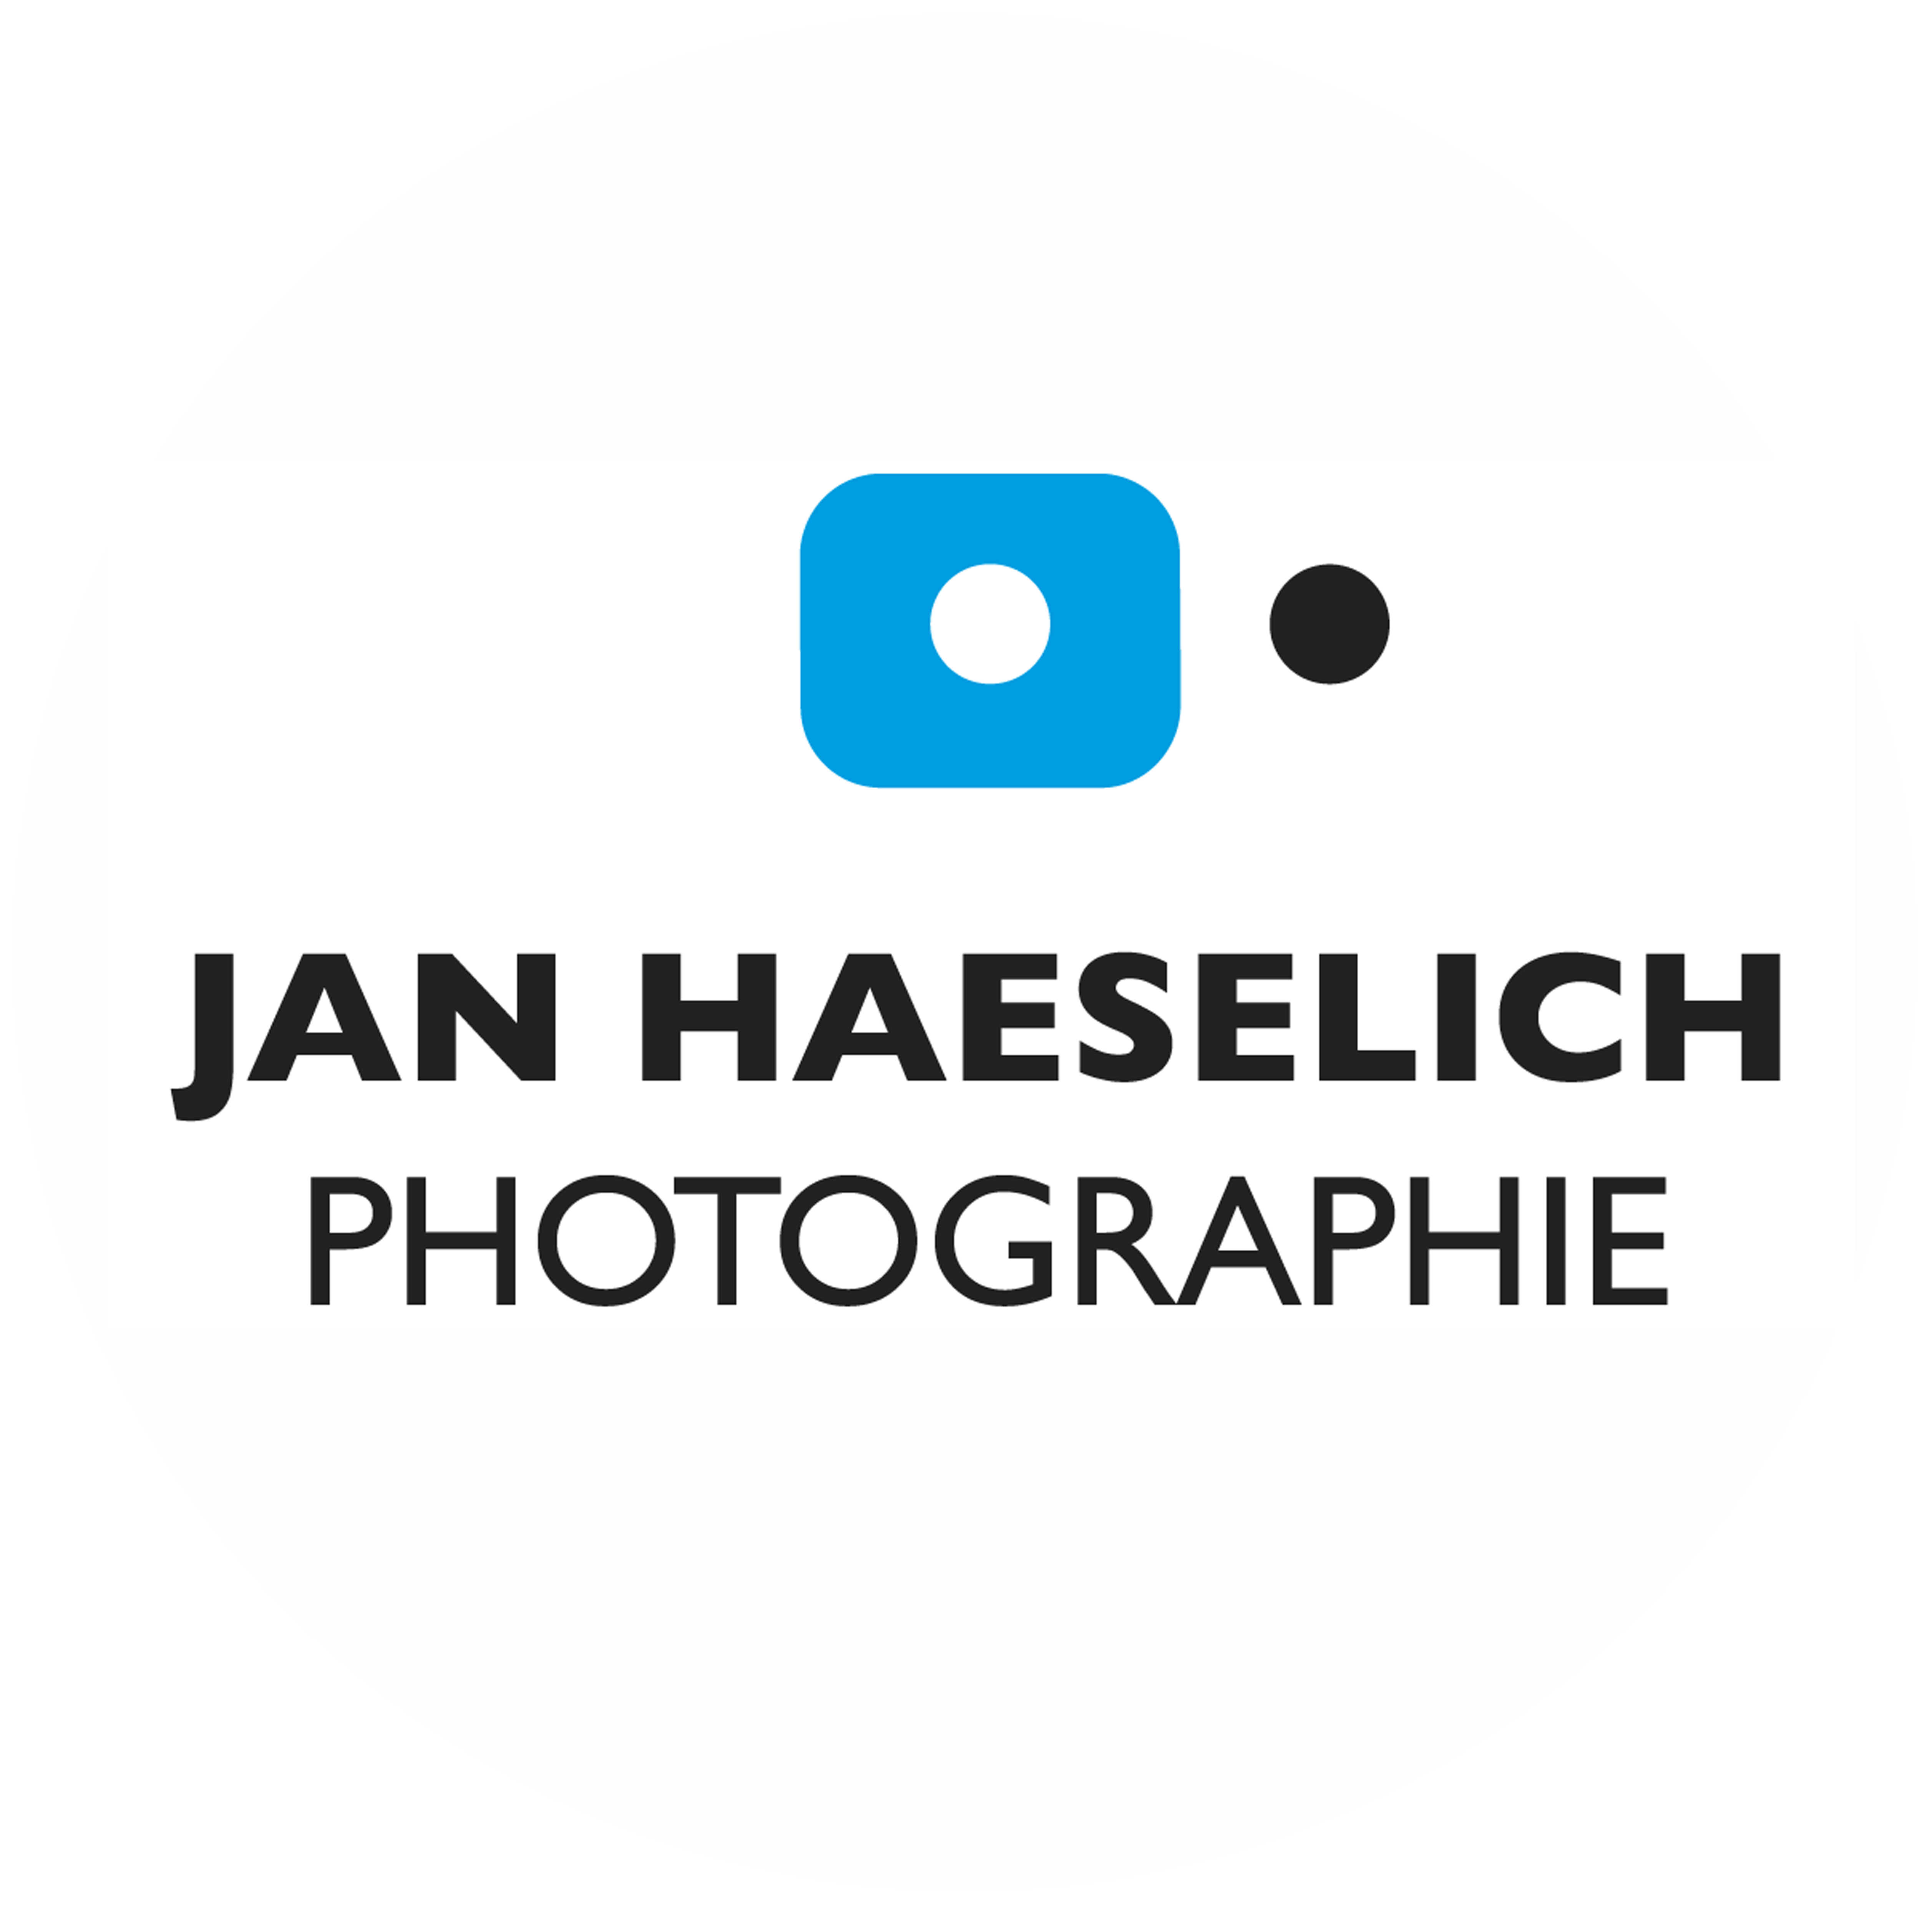 FOODFOTOGRAFIE & FINE ART(s) COLLECTION